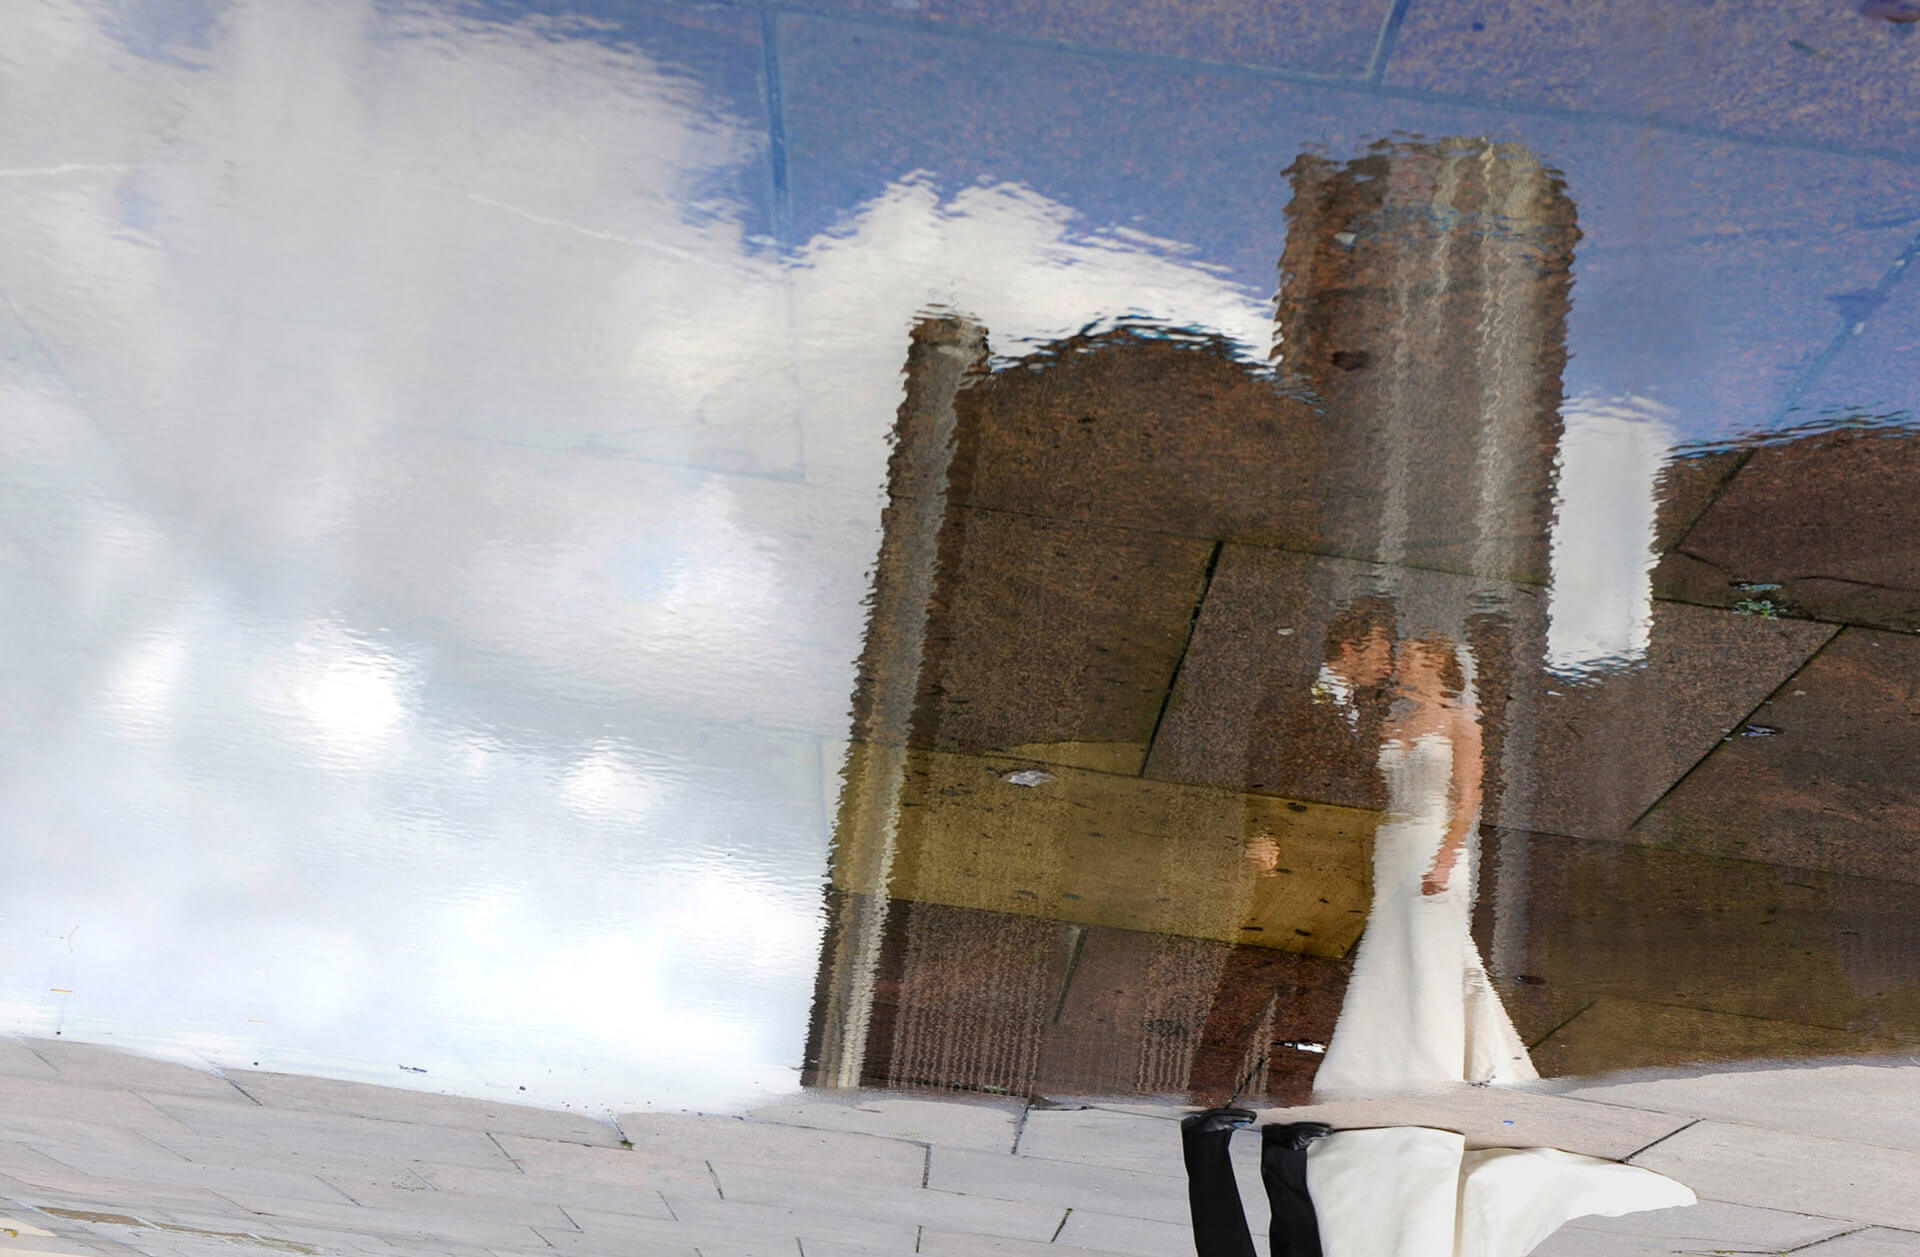 michigan wedding photographer shoots a Detroit wedding couple in a reflection of Detroit's landmark; the Renaissance Center.